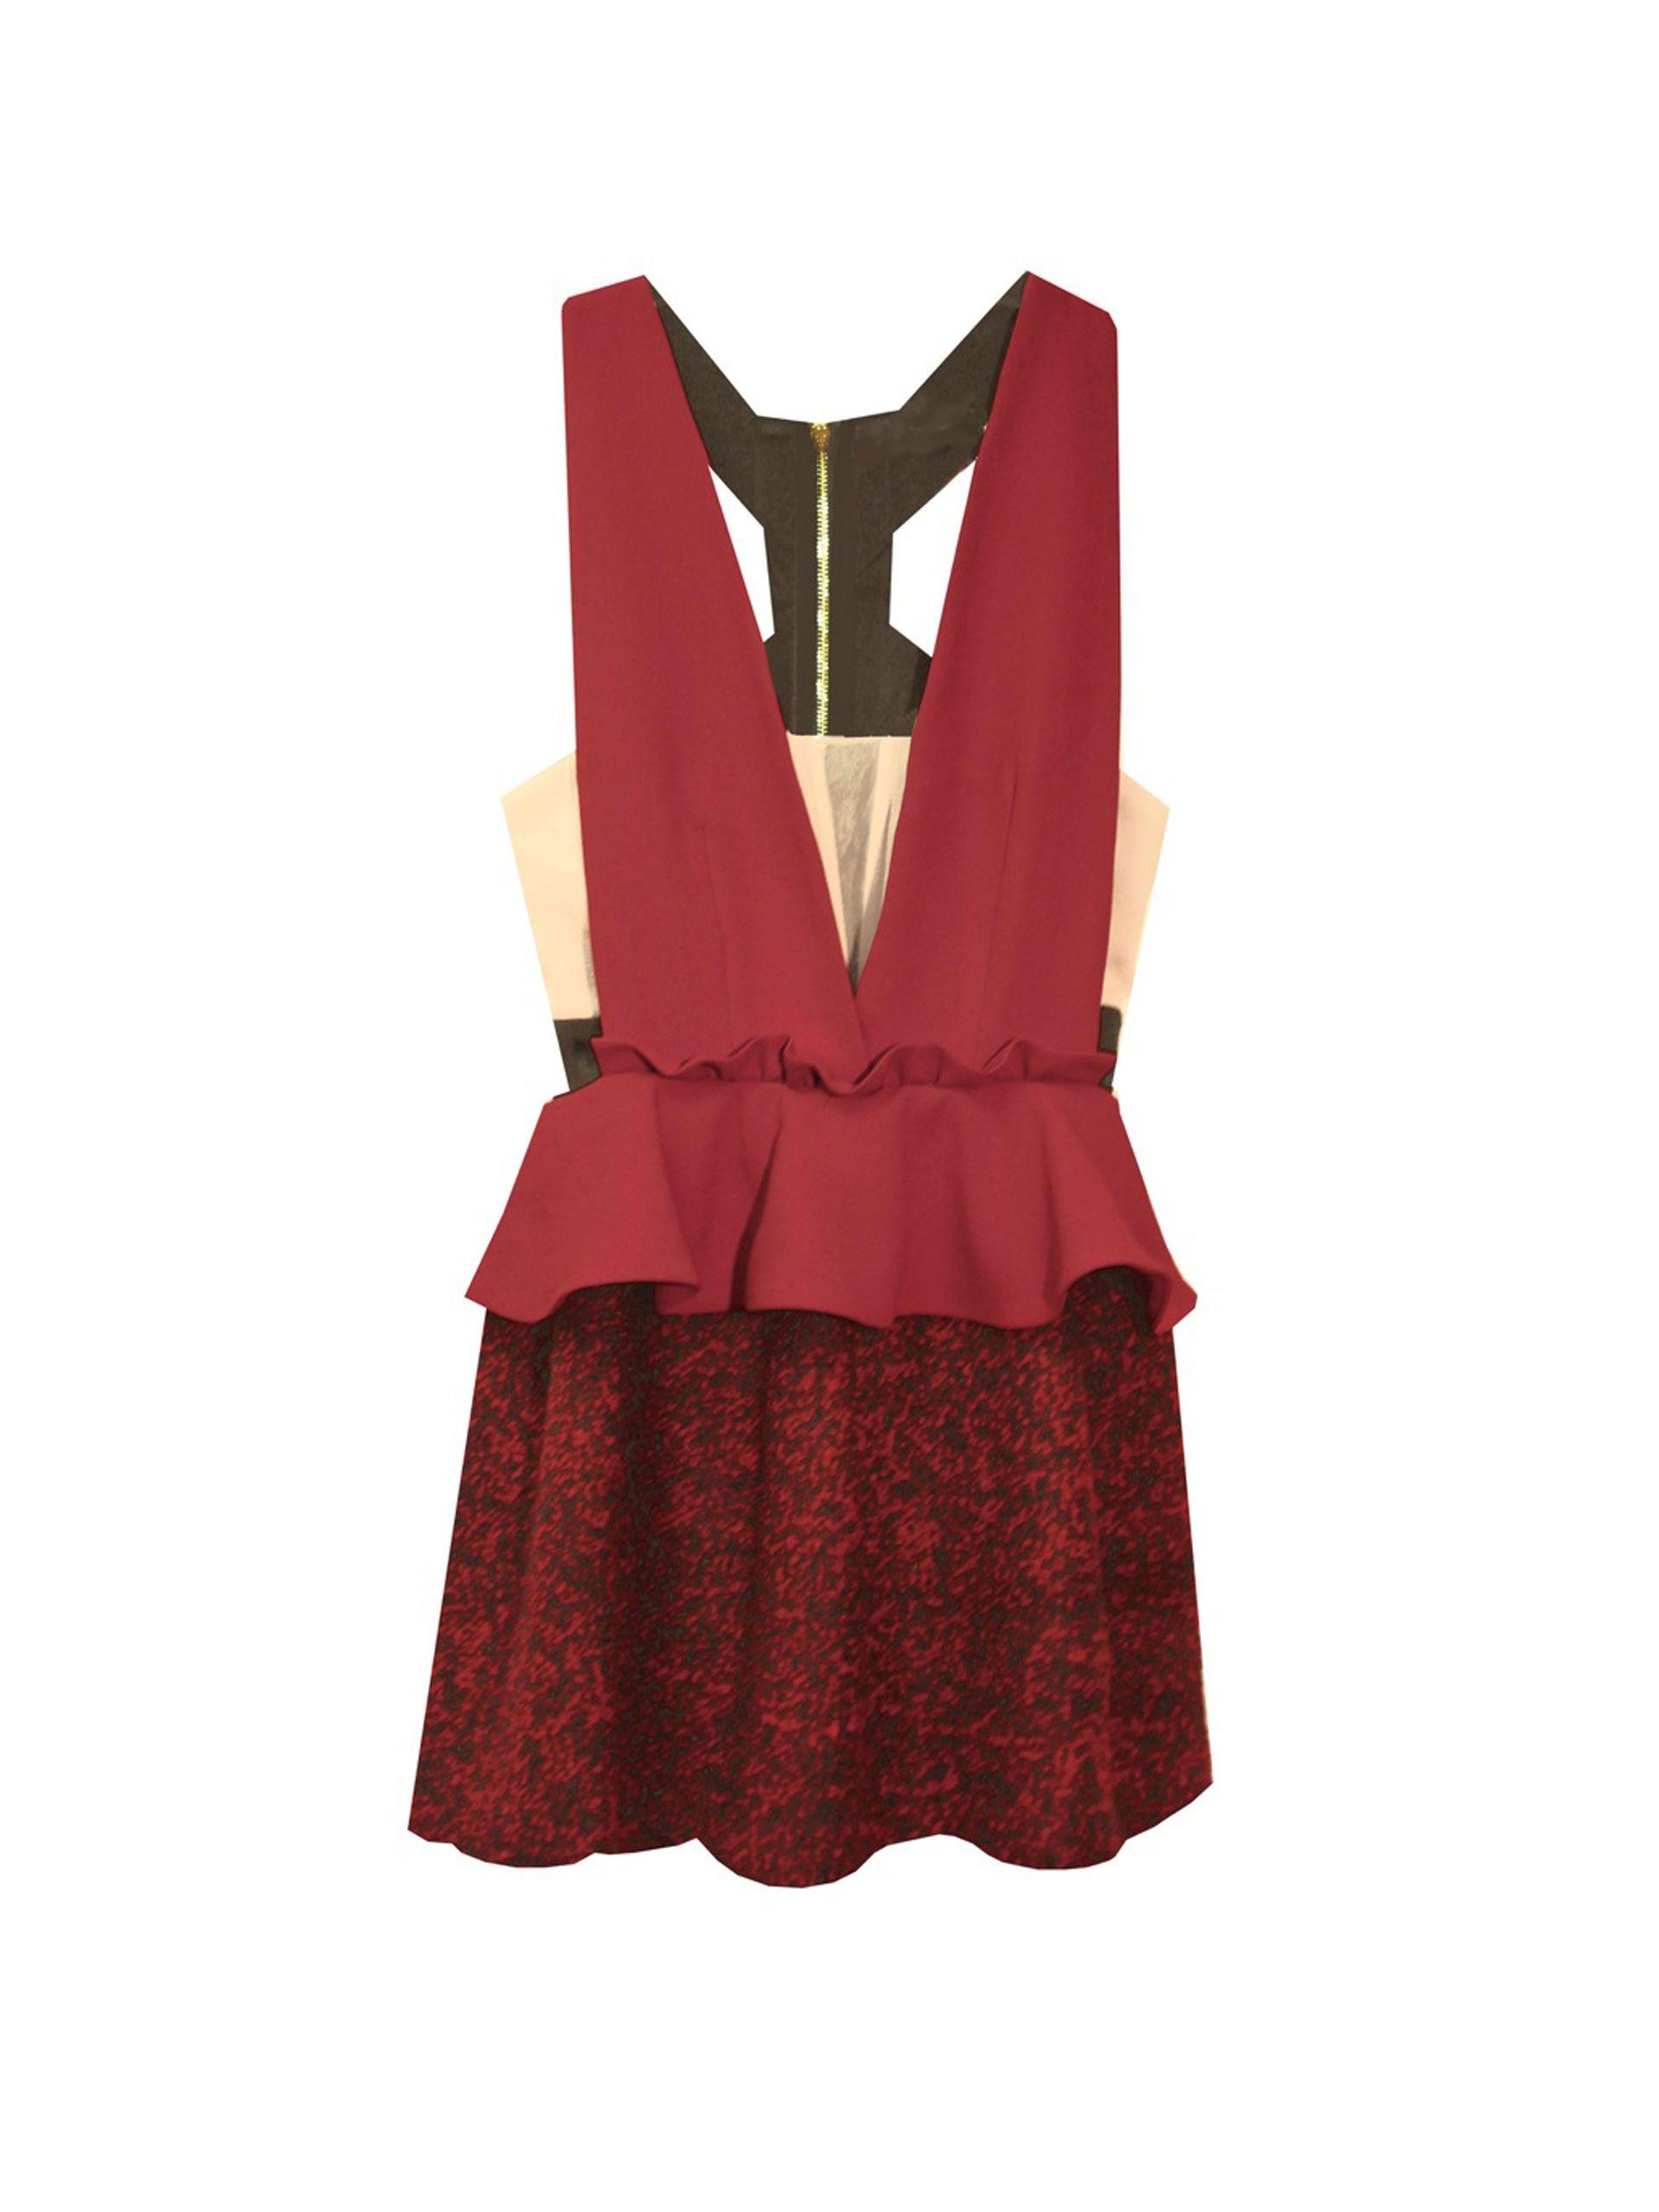 100 Party Dresses Under 500 Torch Tunik Women Burgundy Maroon L